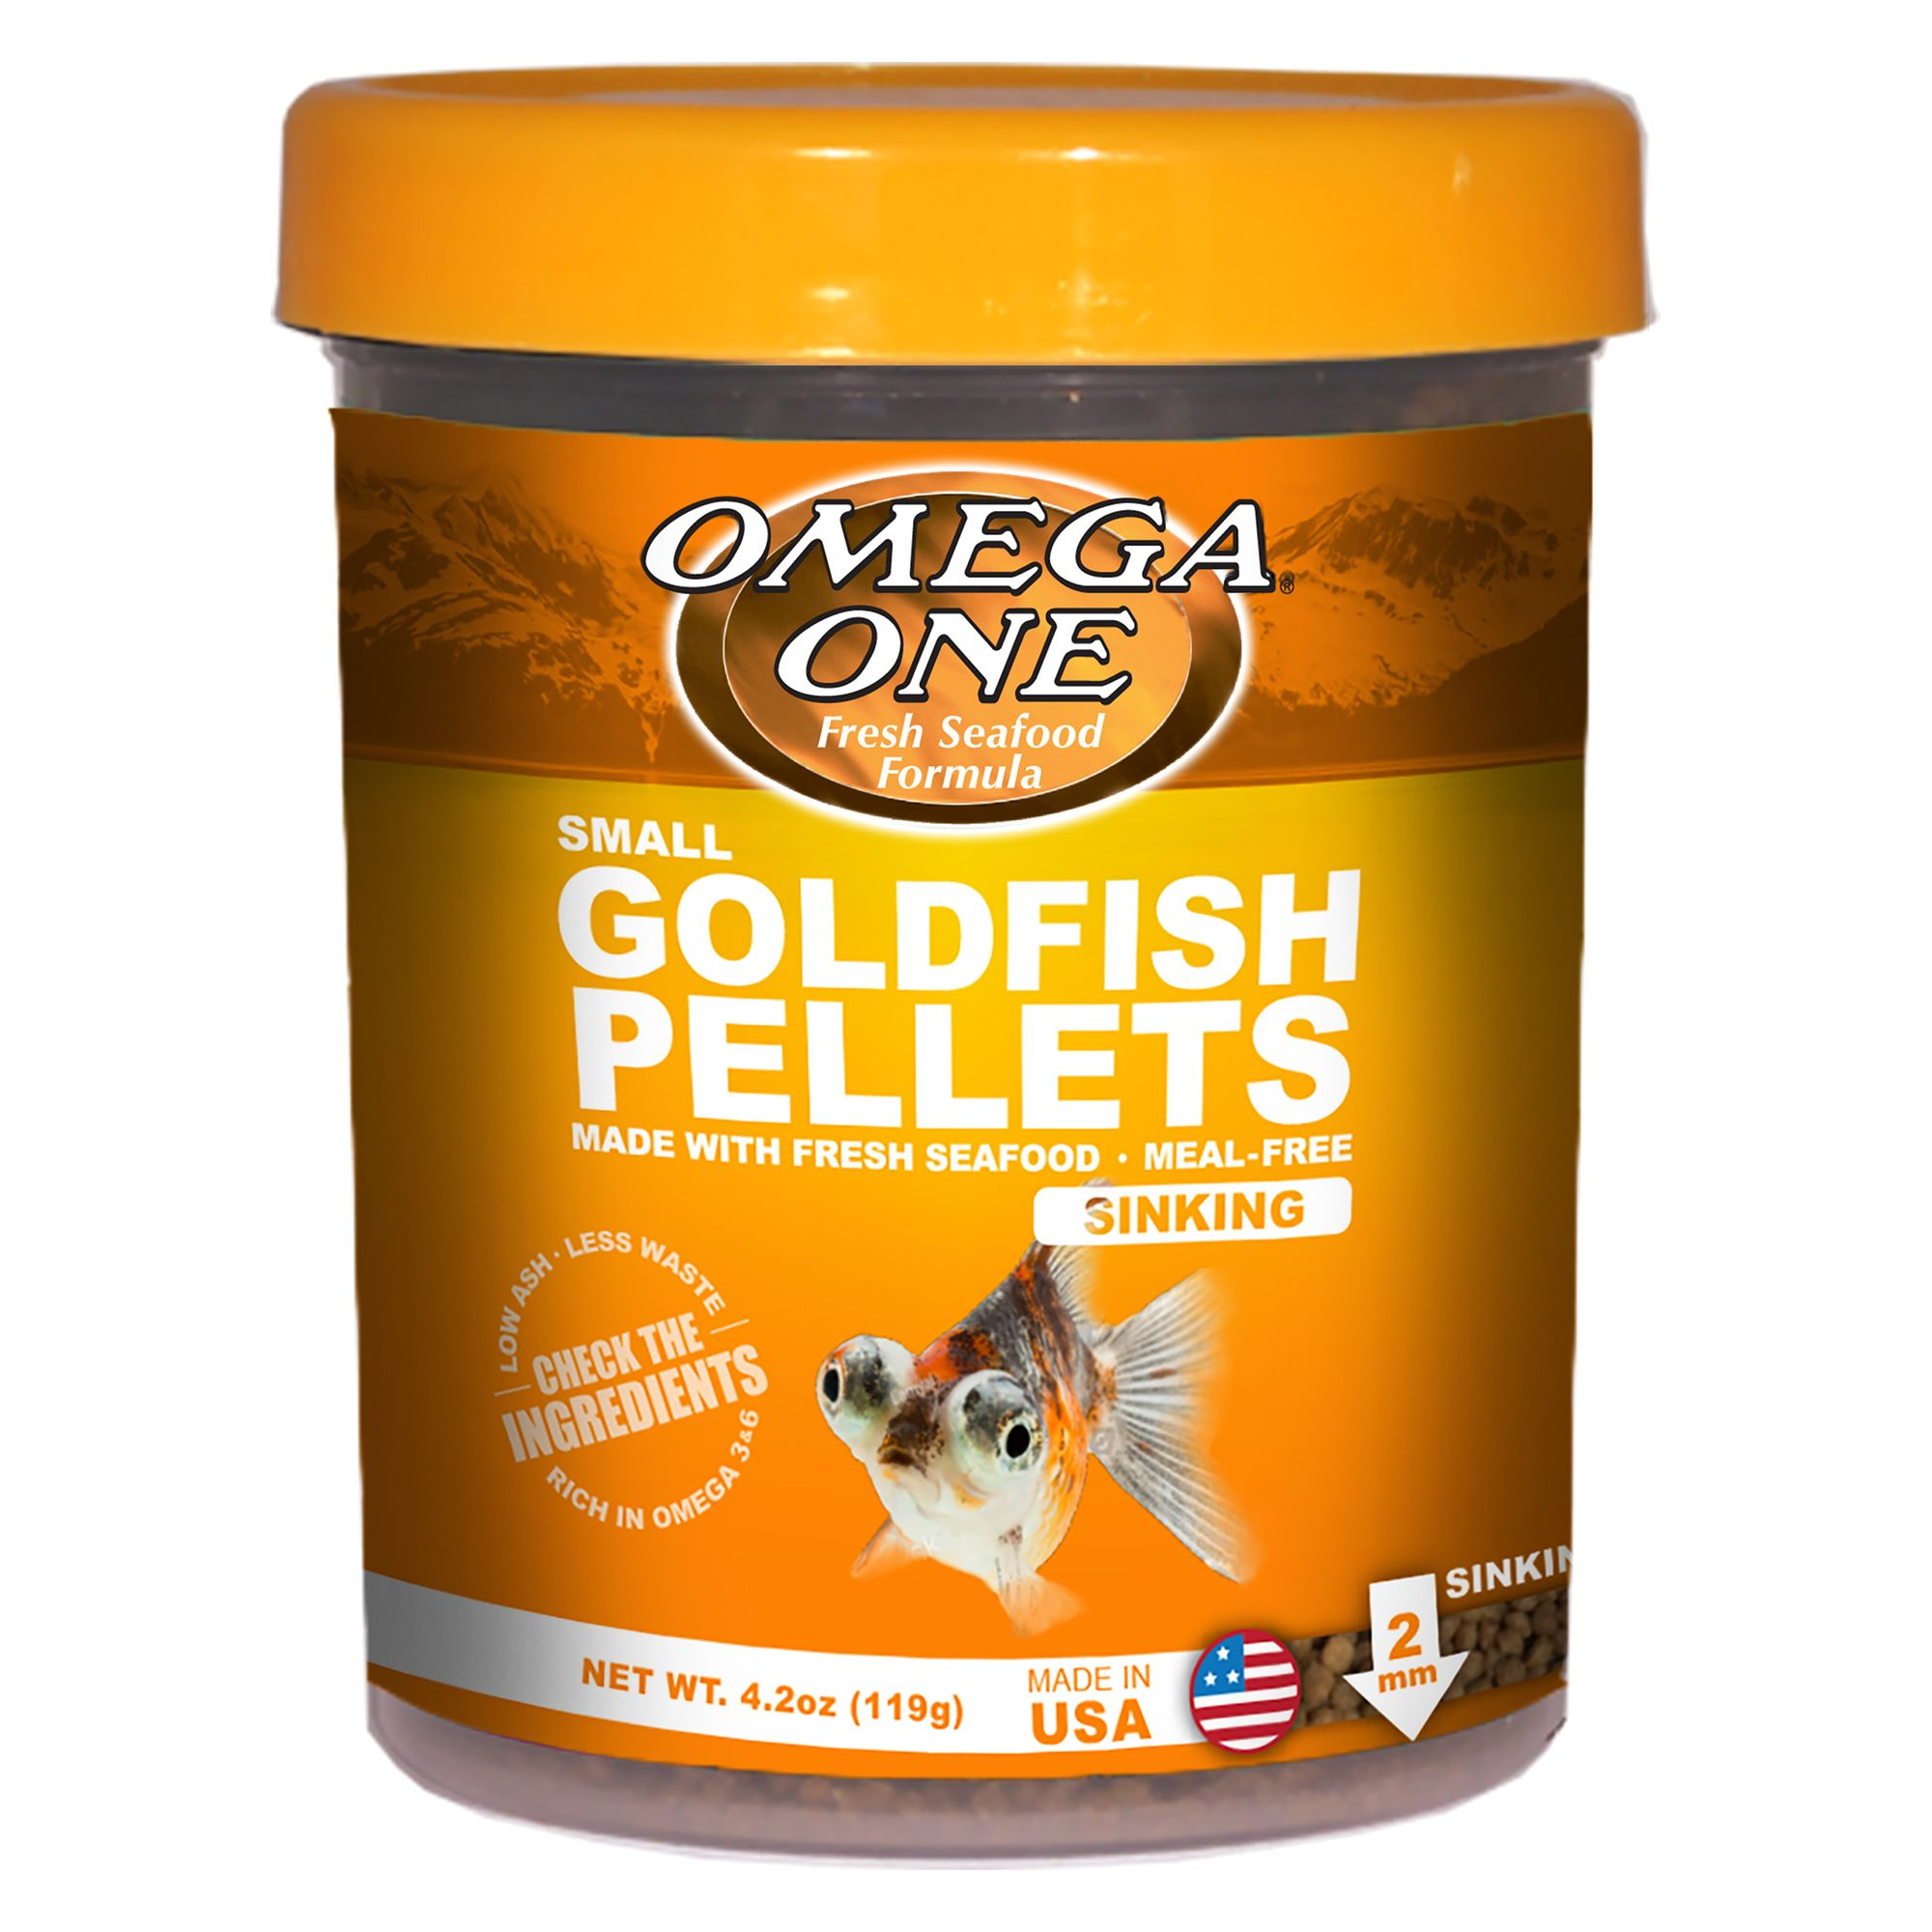 698220023611 upc omega one goldfish small sinking for Betta fish food walmart